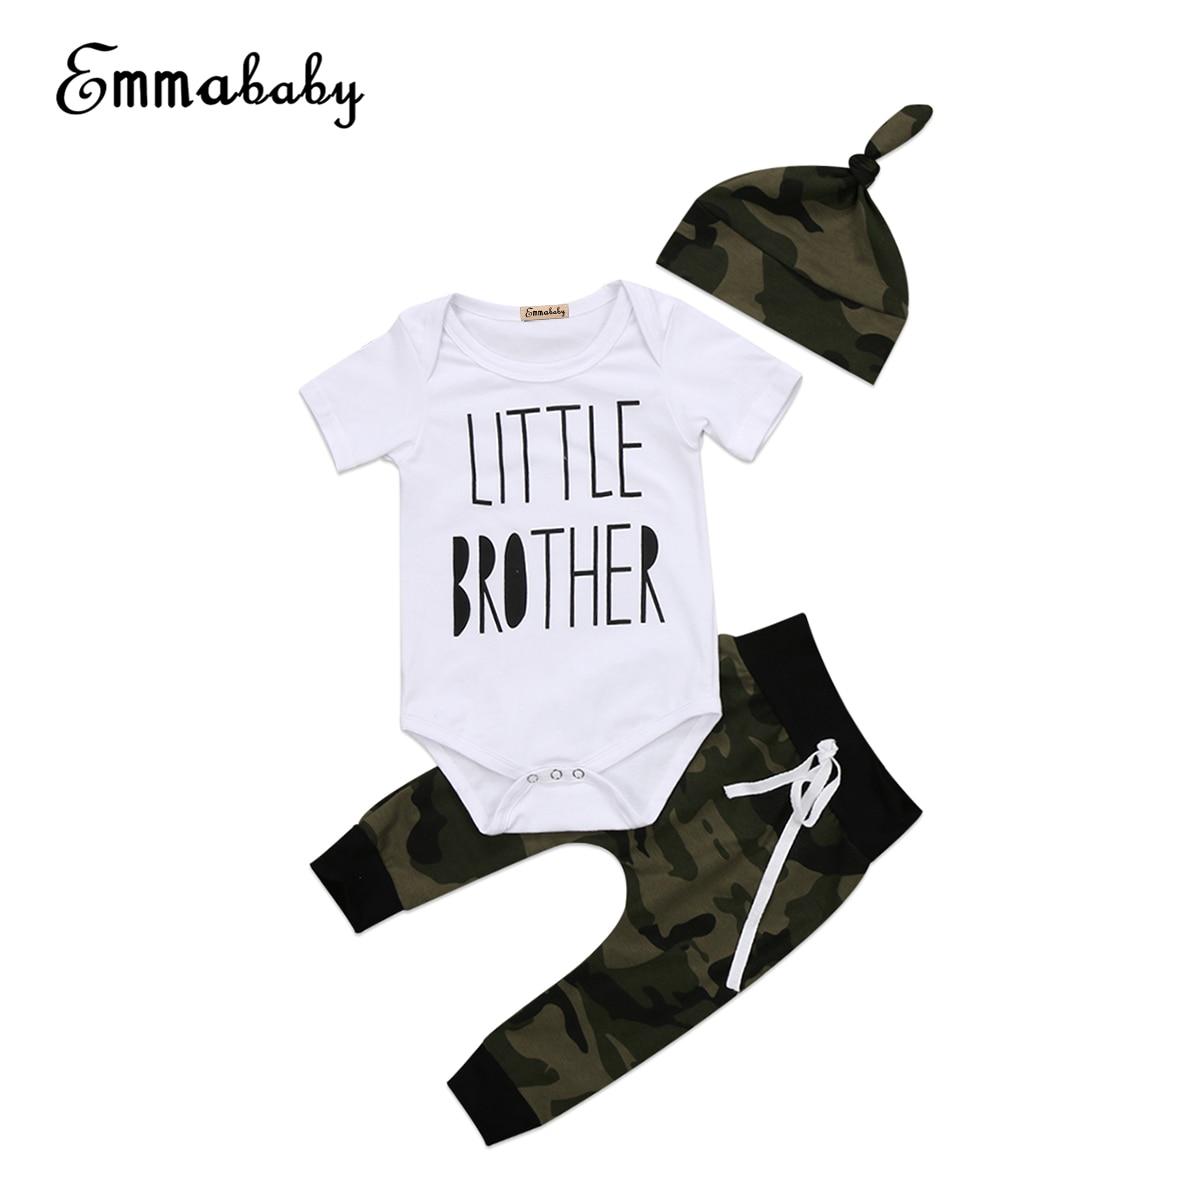 2018 New Baby Boys Clothes Set 3PCS/Set Cotton Camoflage Clothing Short Sleeve Romper Tops+Camo Pants Leggings Hat 3pcs Outfits